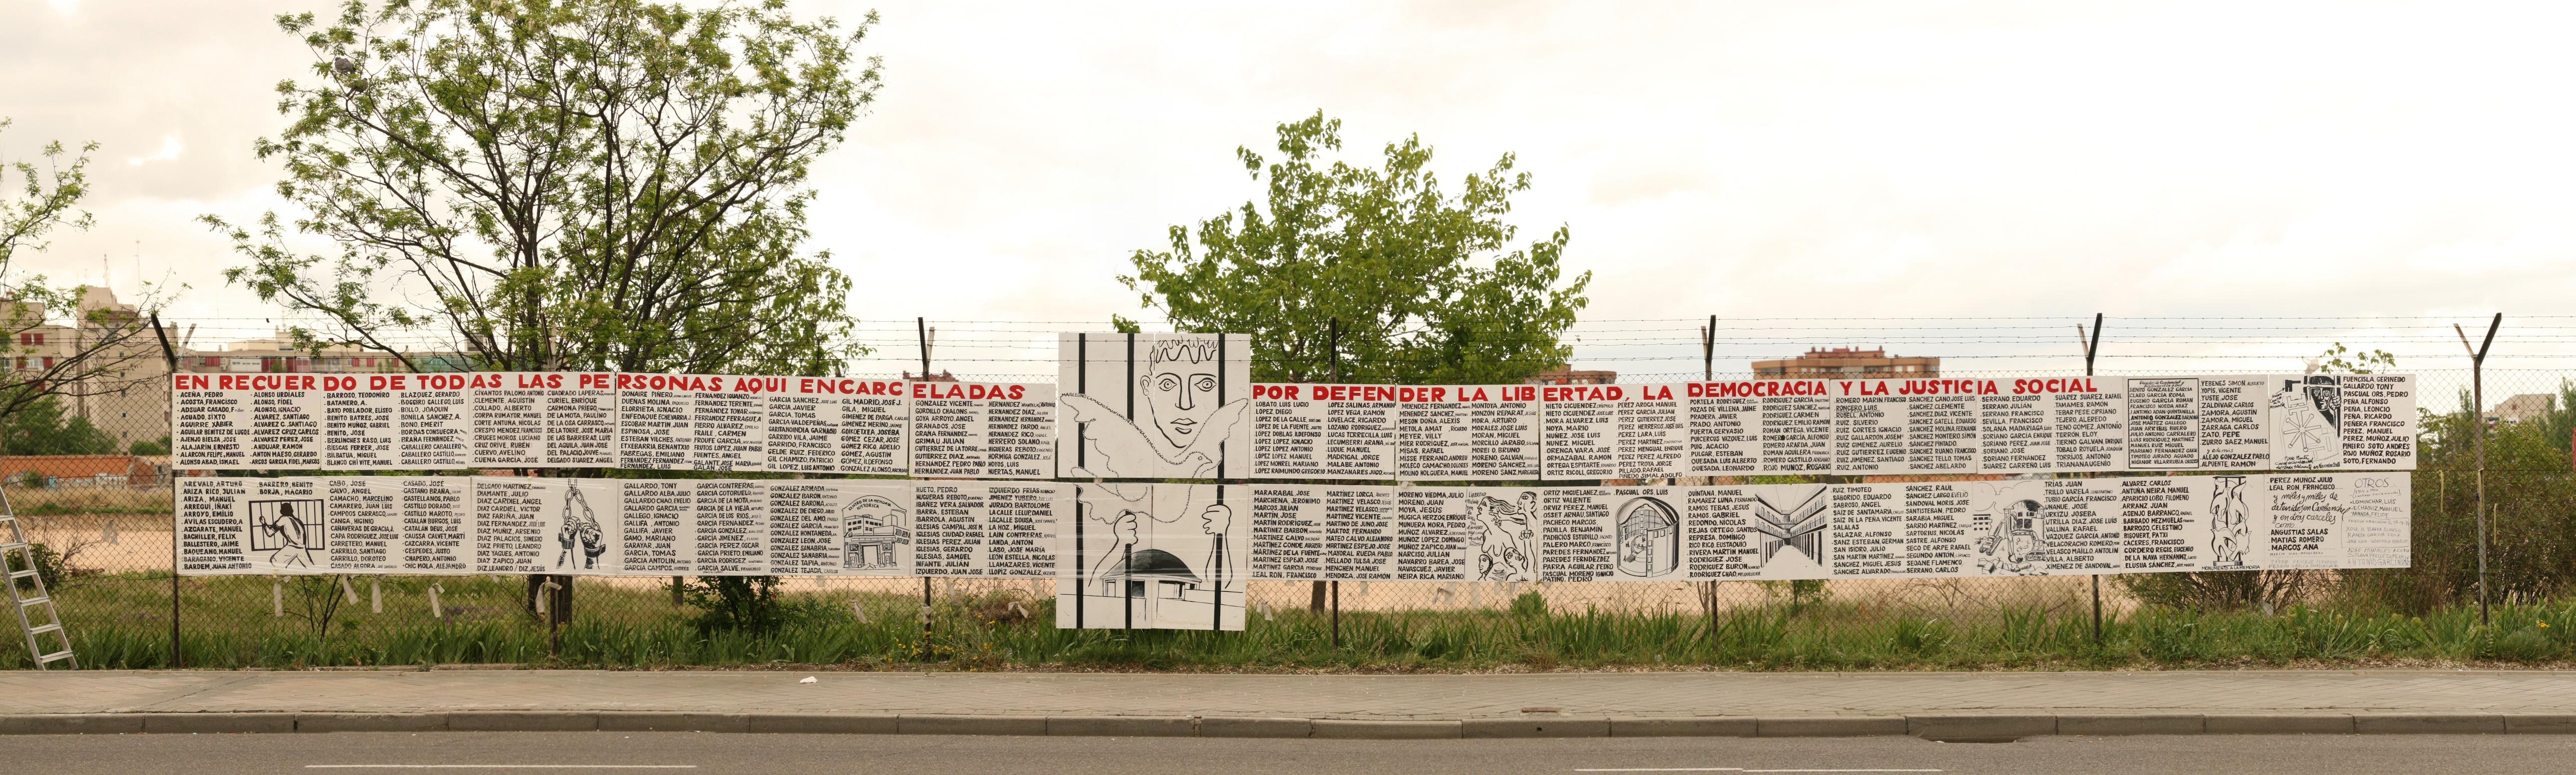 Víctimas del franquismo. Cárcel de Carabanchel